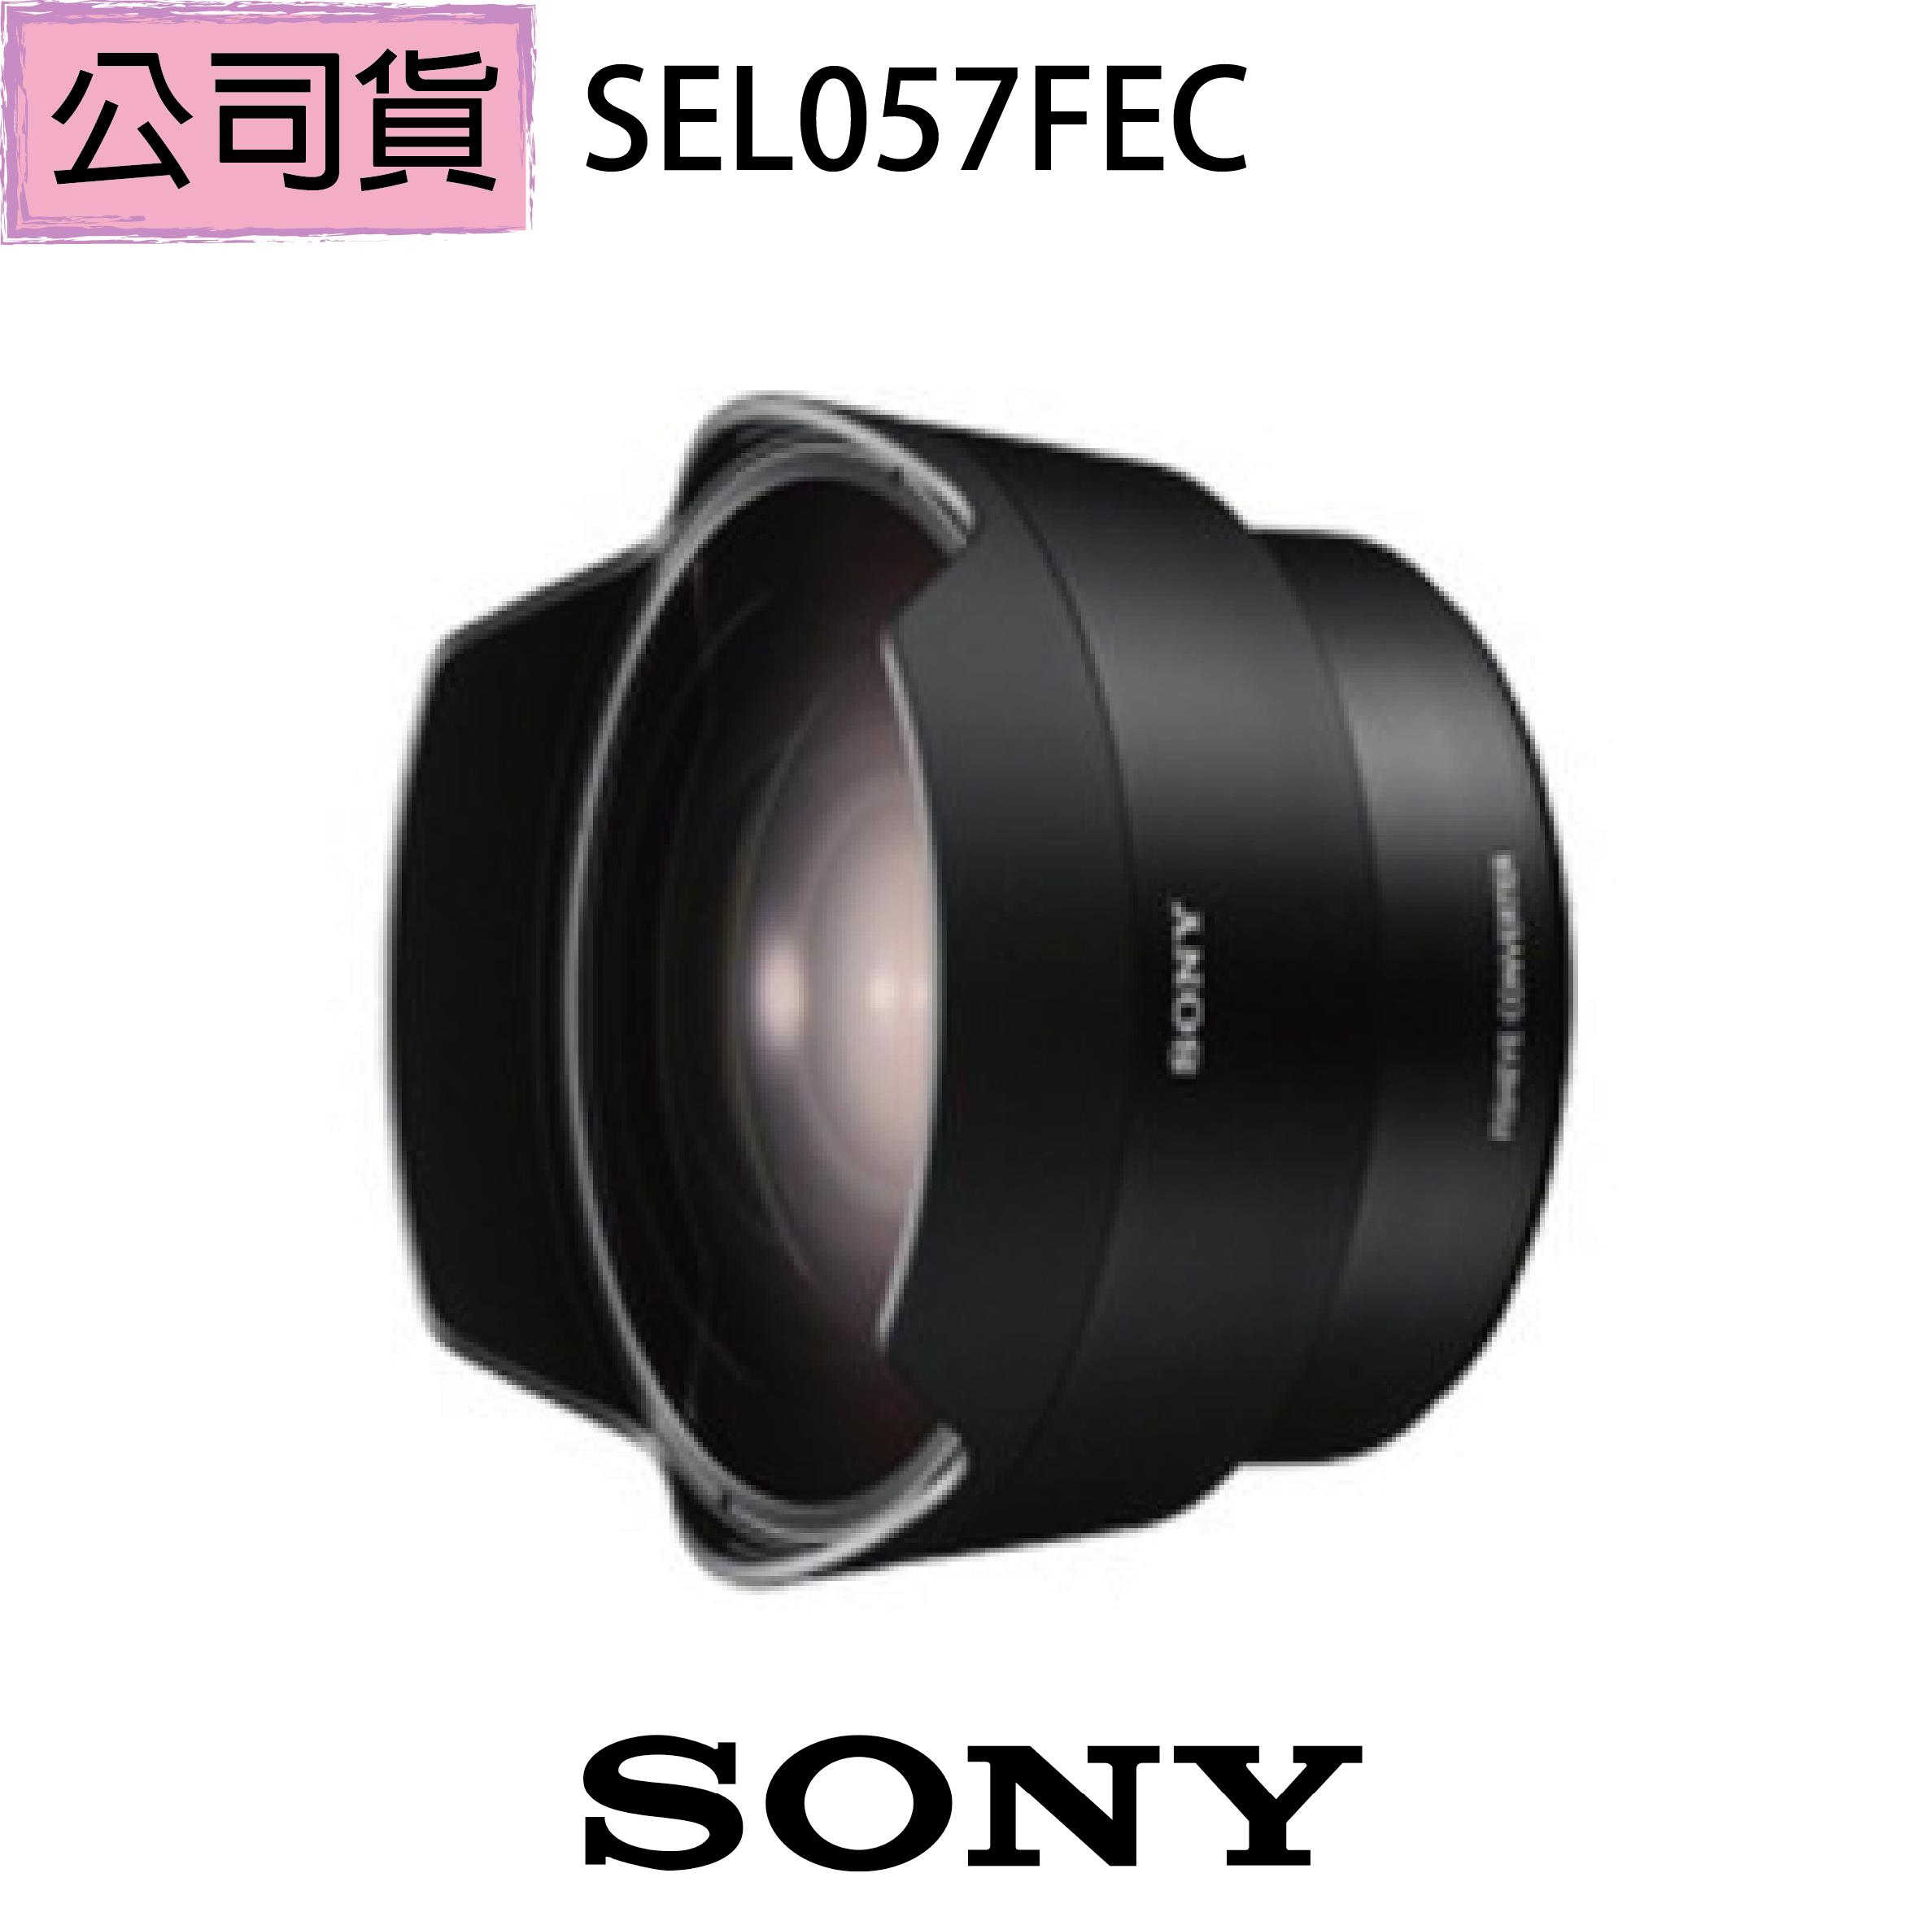 【SONY】SEL057FEC 魚眼轉接鏡(公司貨)